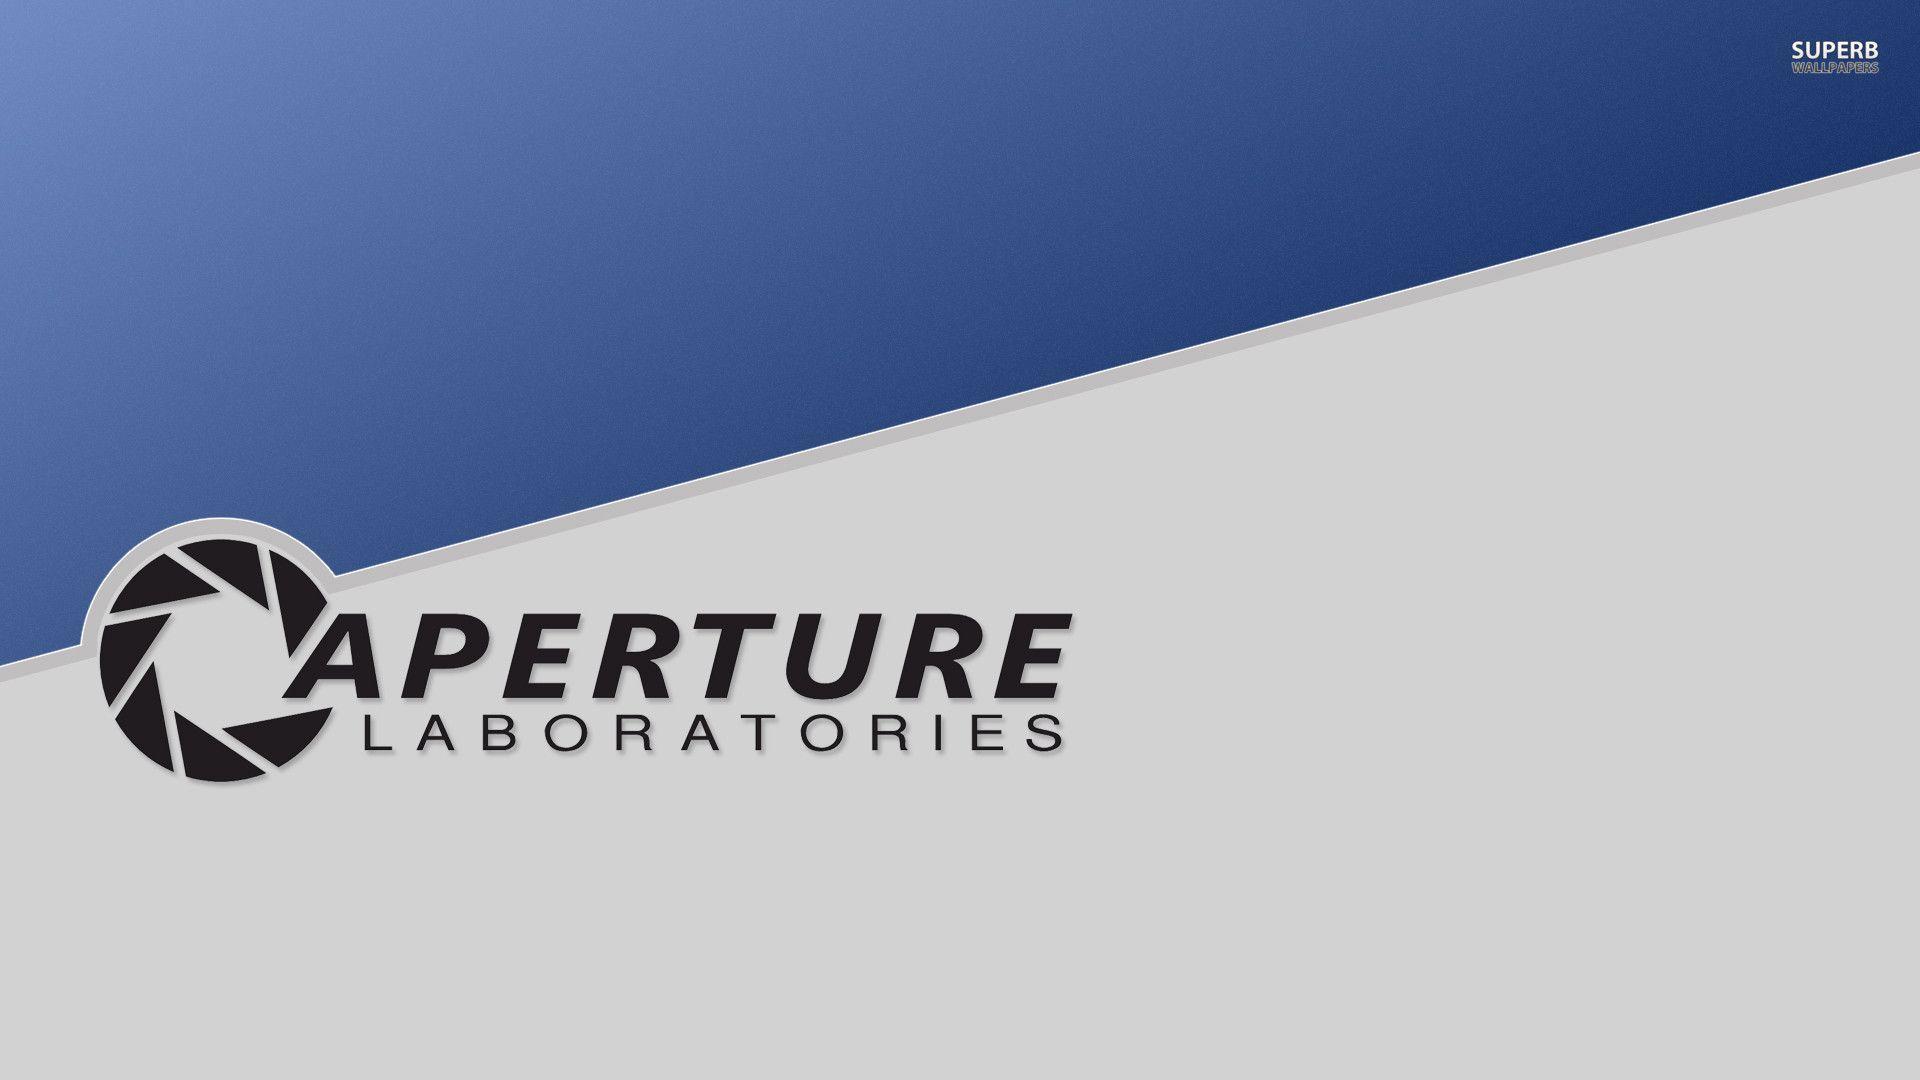 aperture wallpaper - photo #10